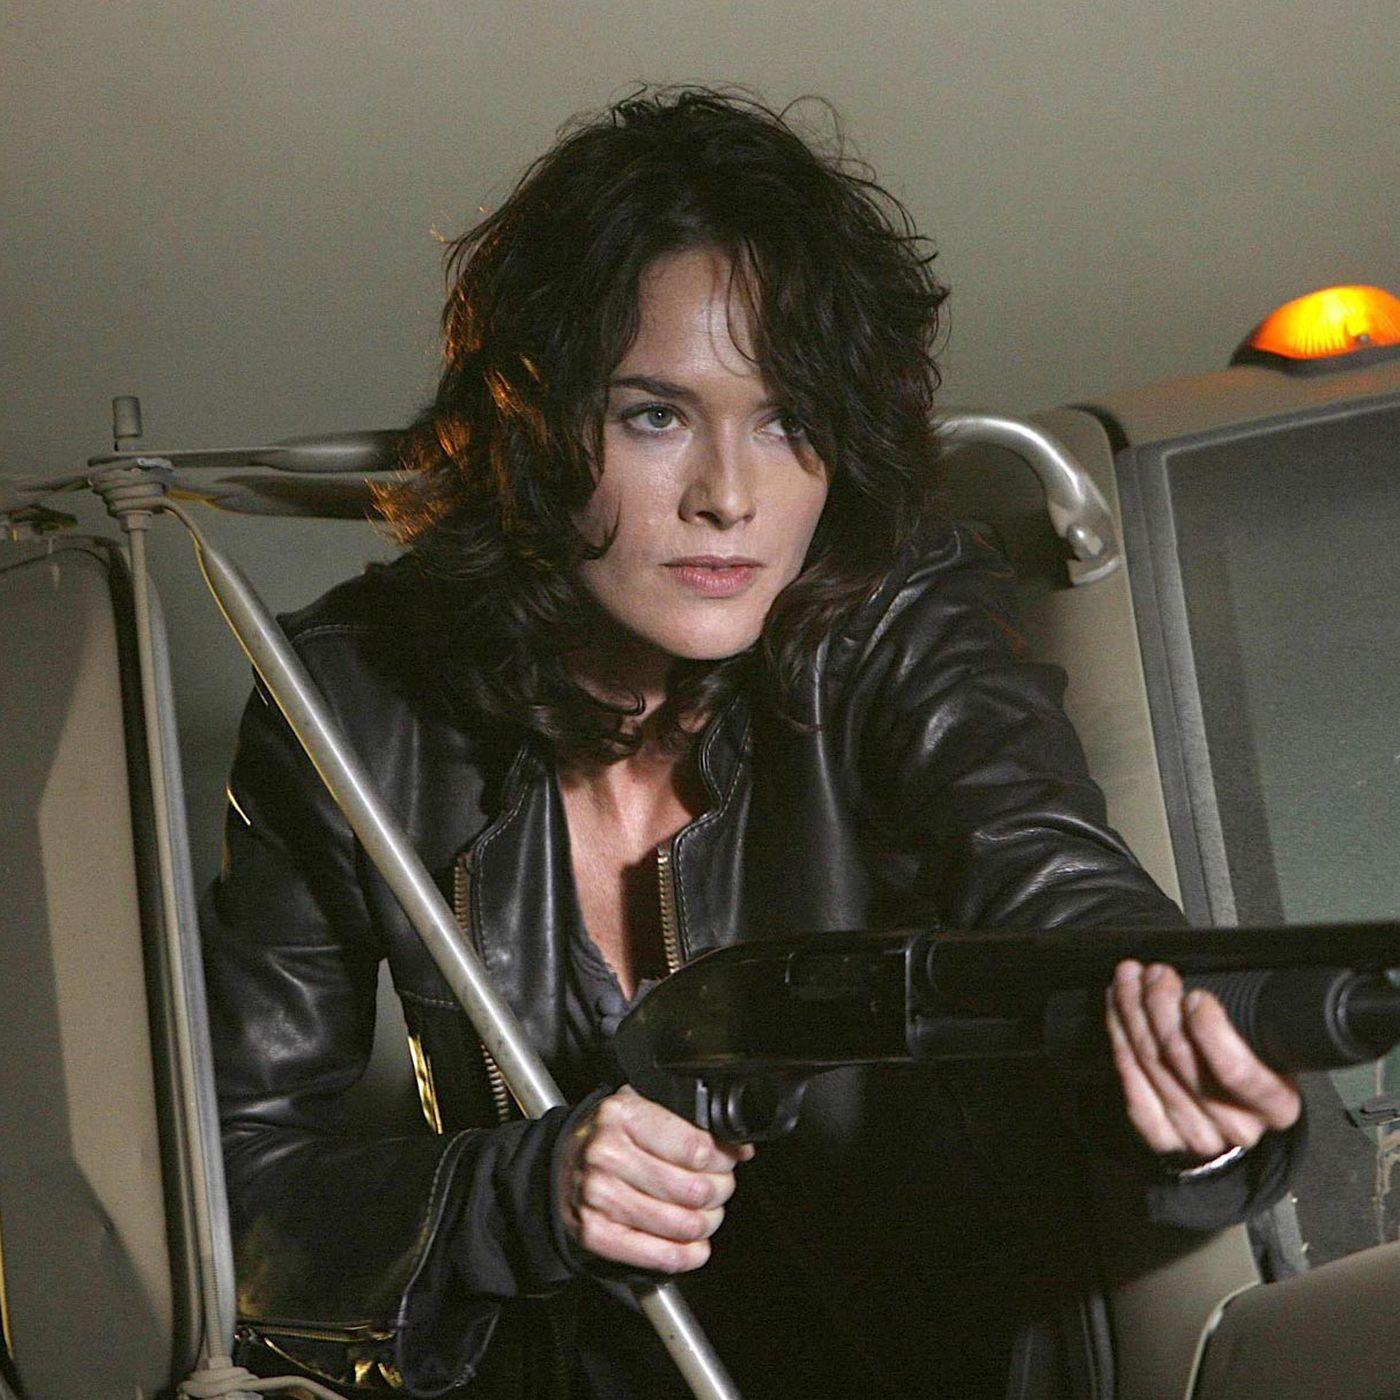 Terminator: The Sarah Connor Chronicles (2008-2009)